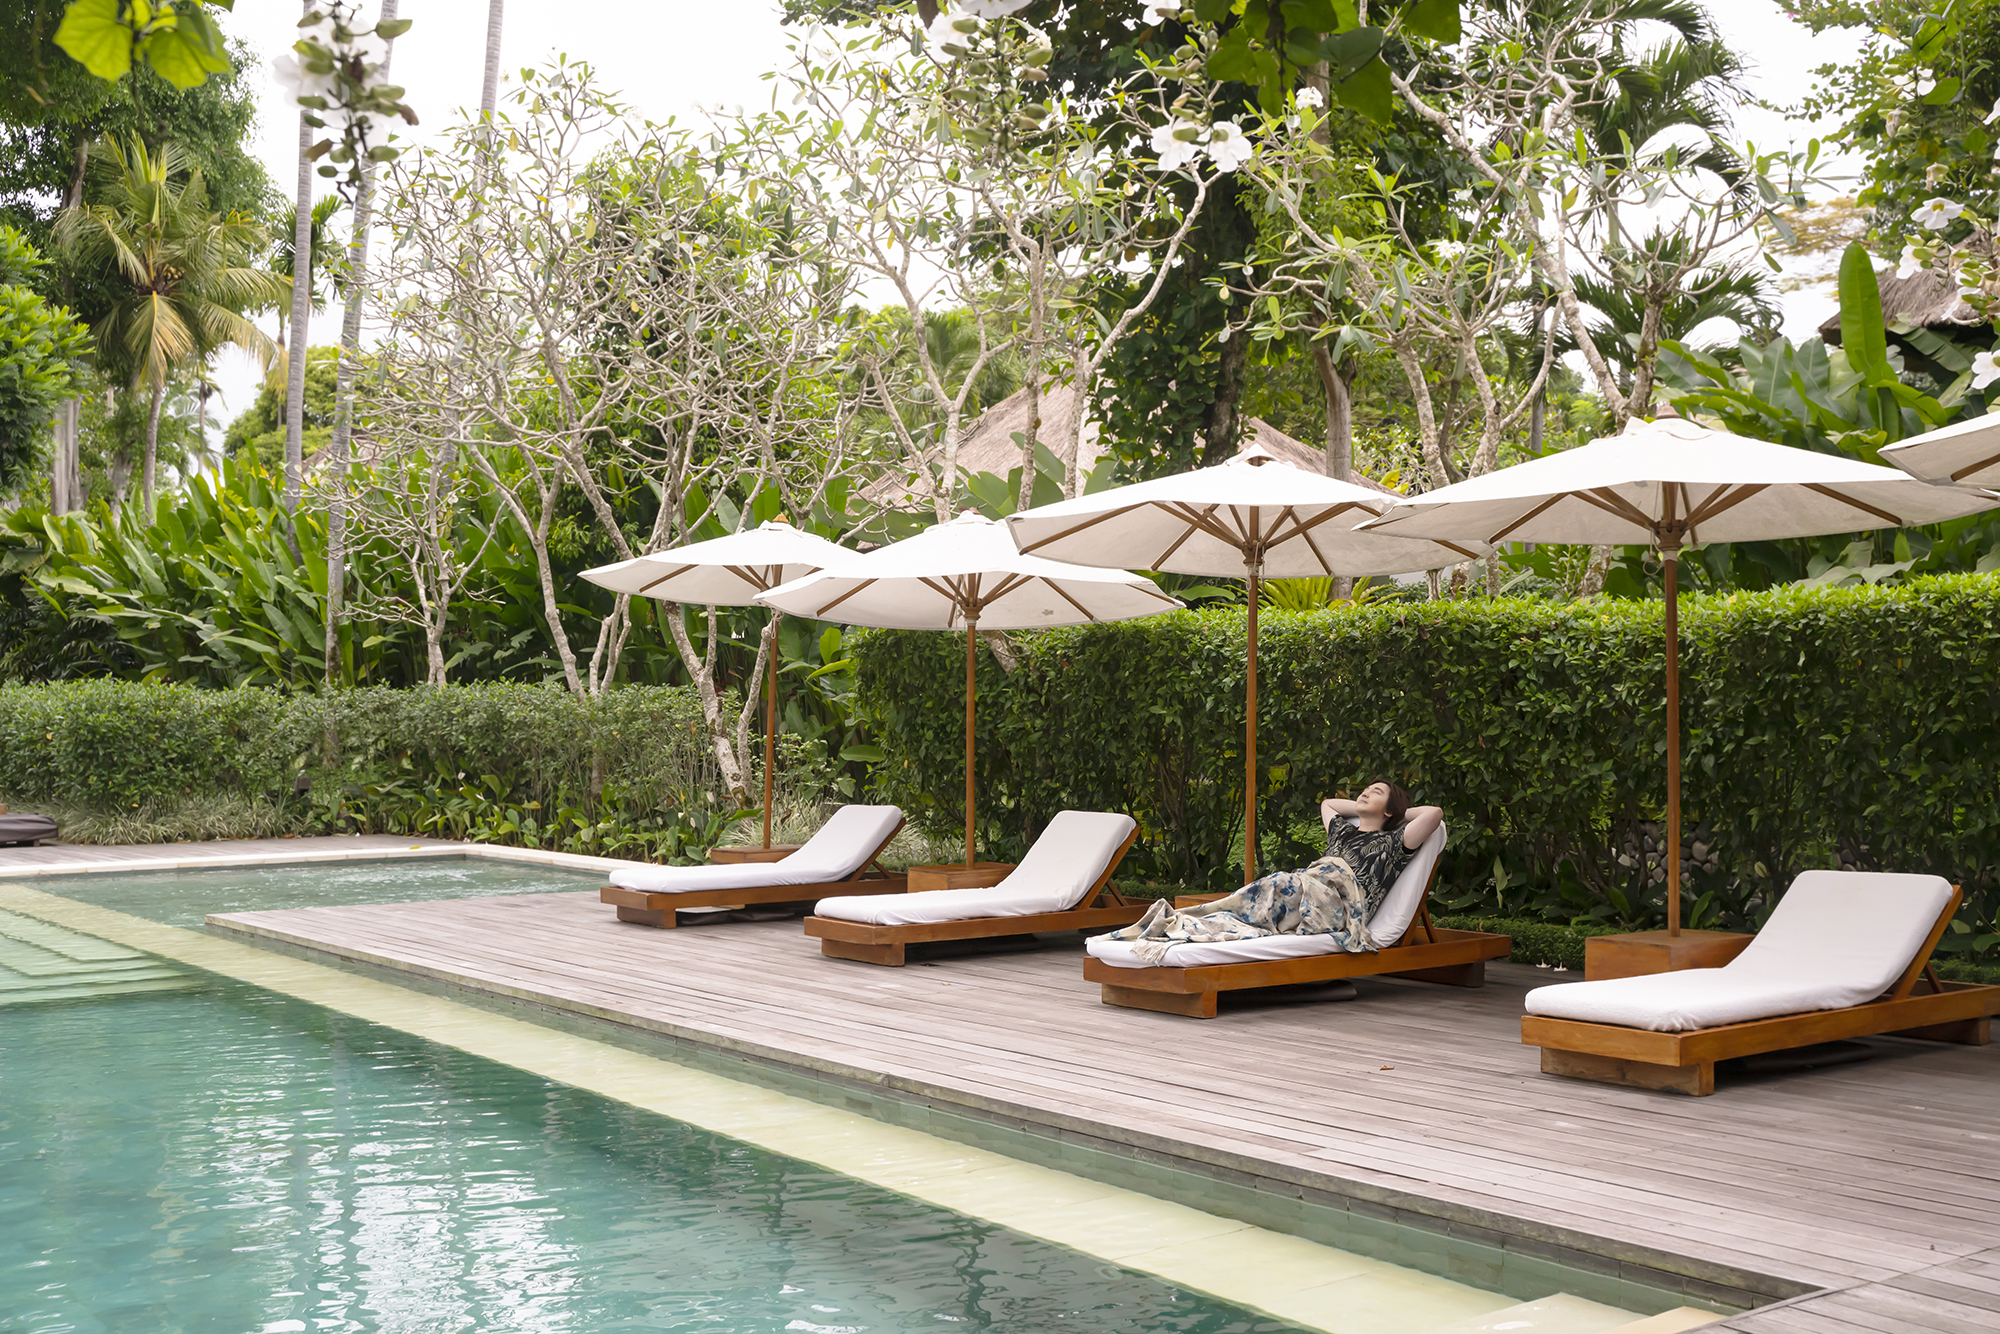 Experience Central Ubud Luxurious Resort at Como Uma Ubud